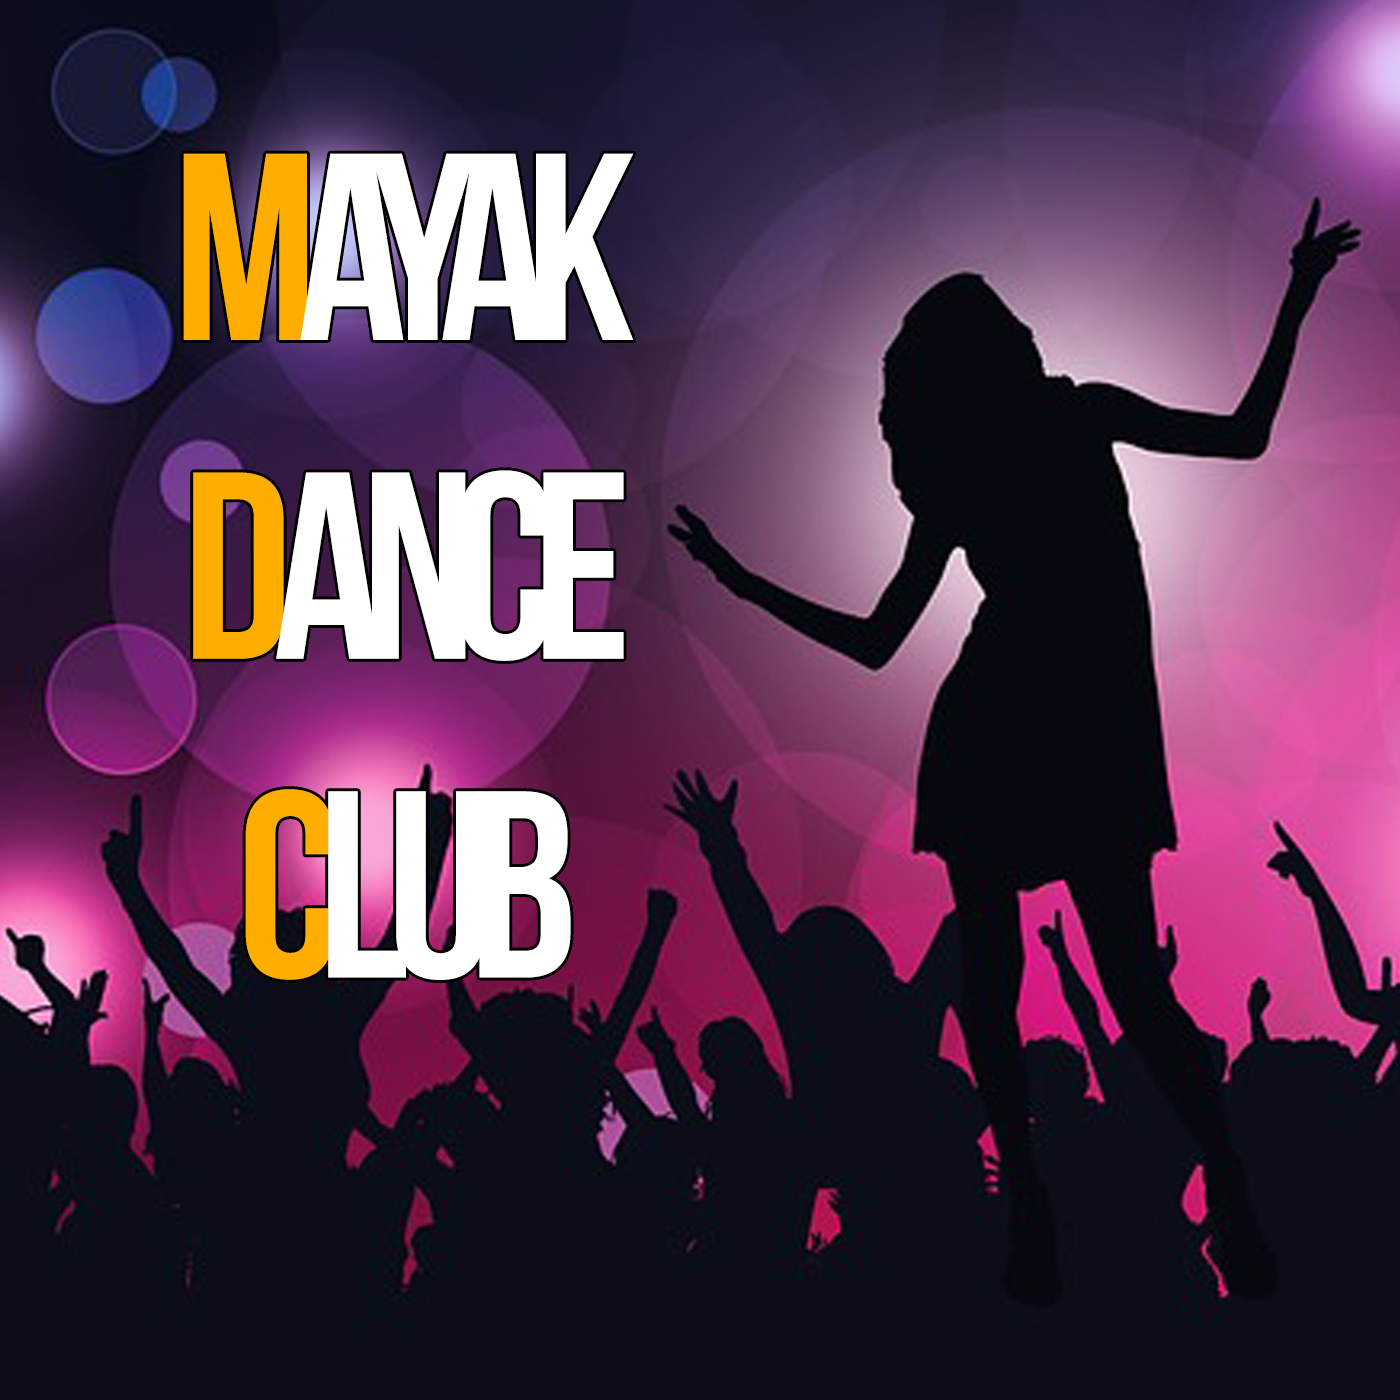 Mayak Dance Club